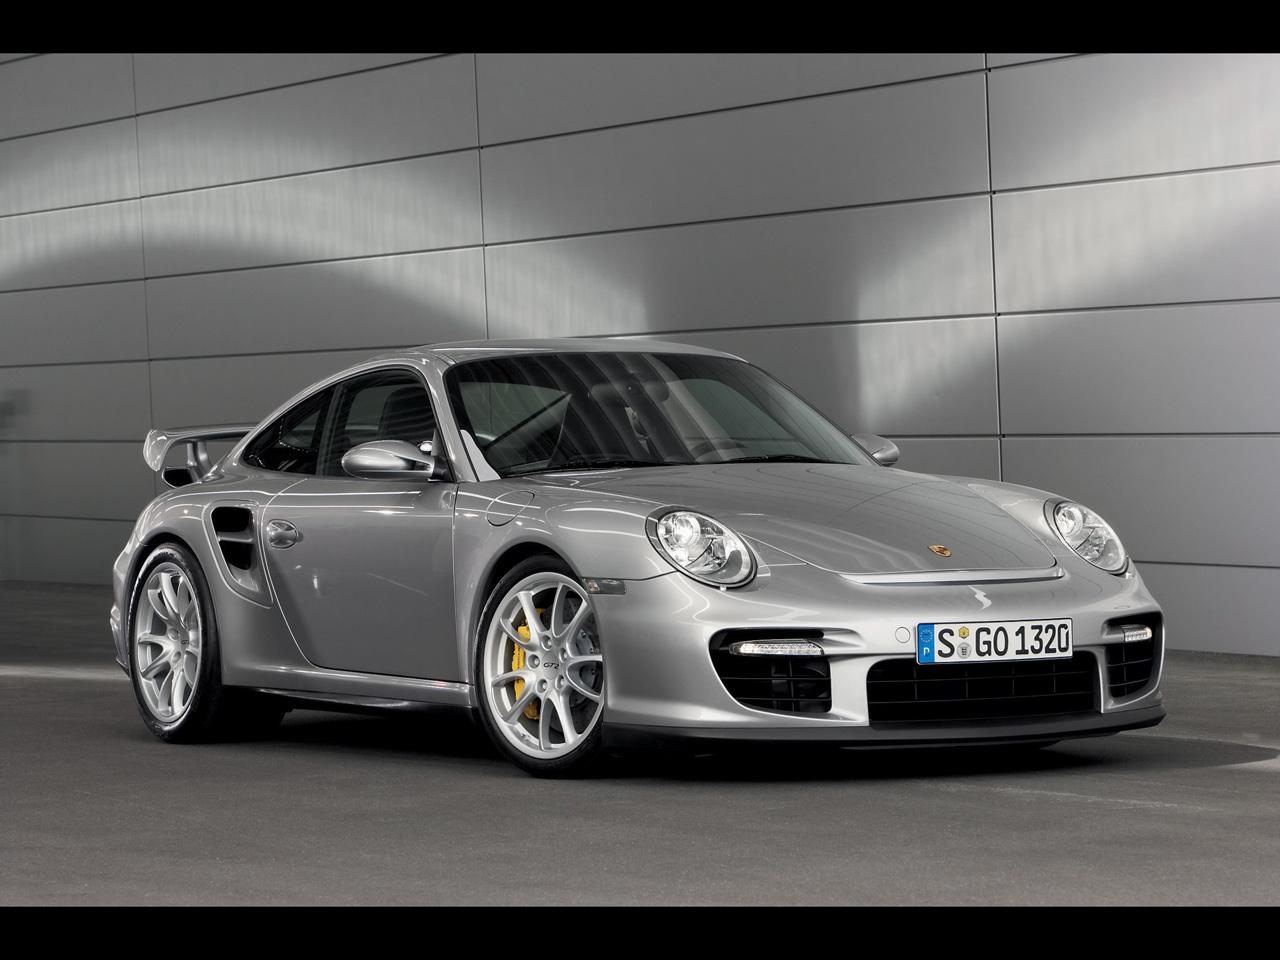 2008 Porsche 911 picture